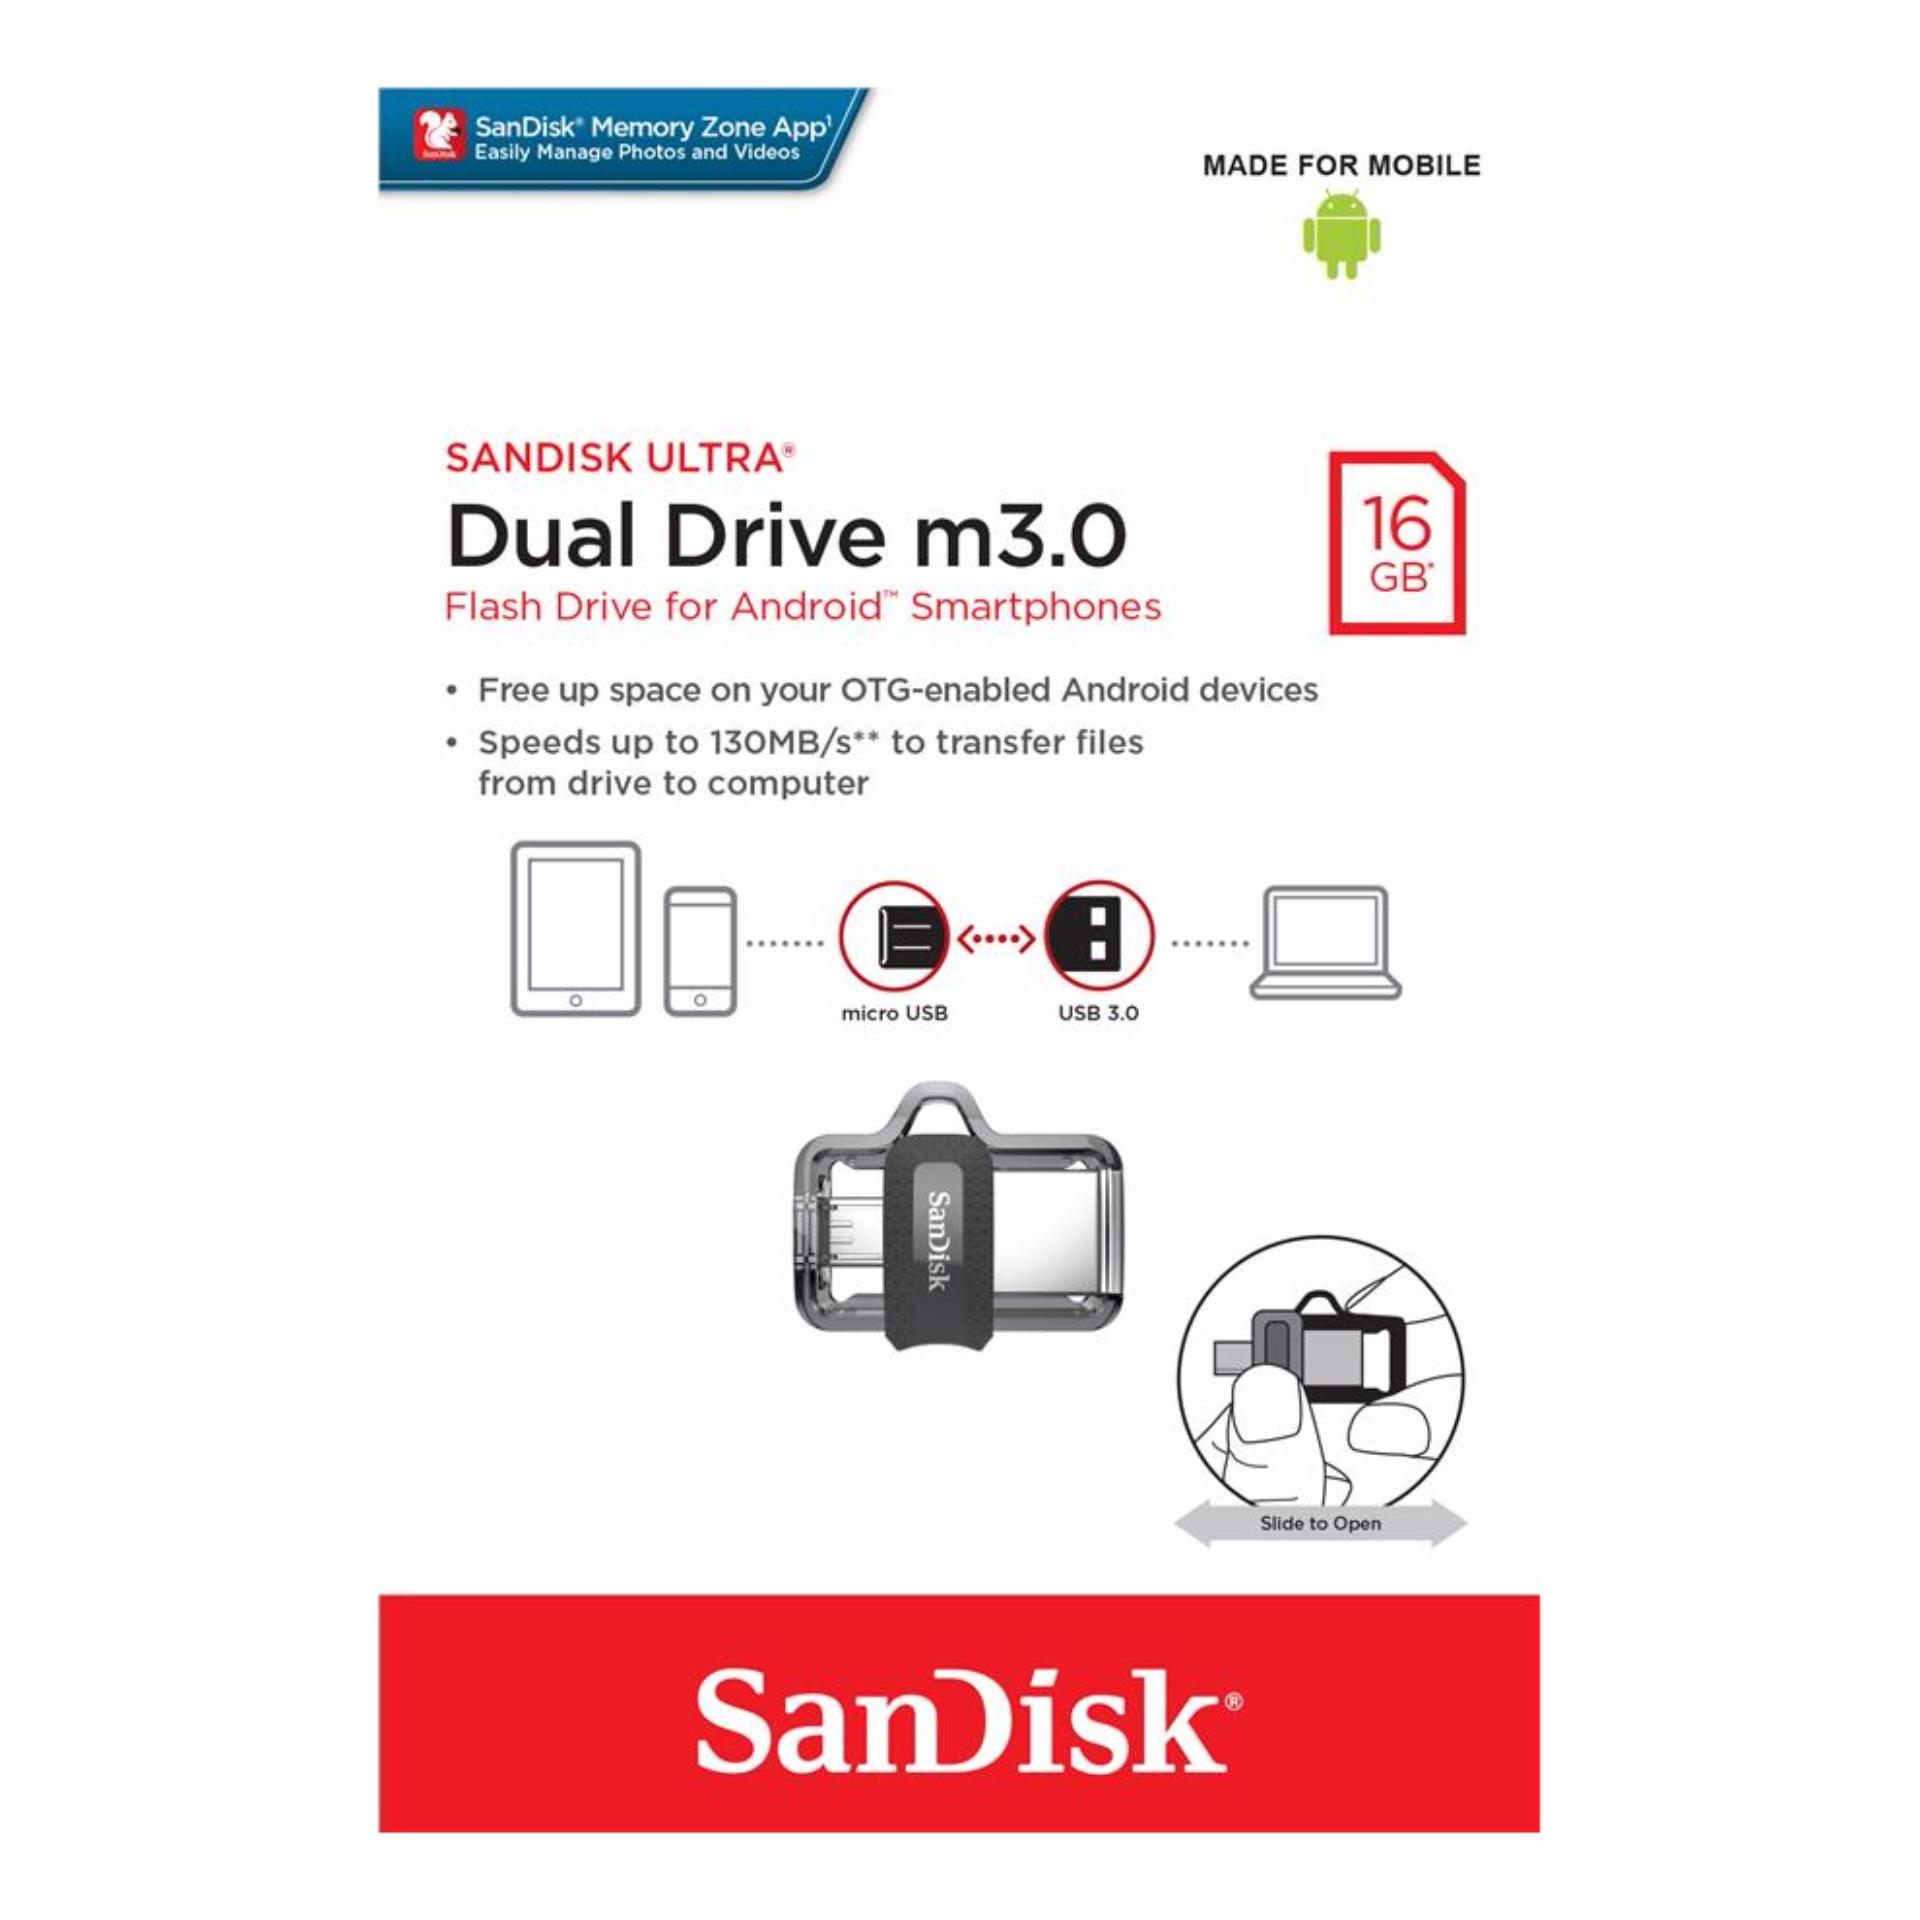 Philippines Sandisk Ultra Sddd3 016g 16gb Otg Dual Usb Drive M3 Flasdisk M30 Translucent